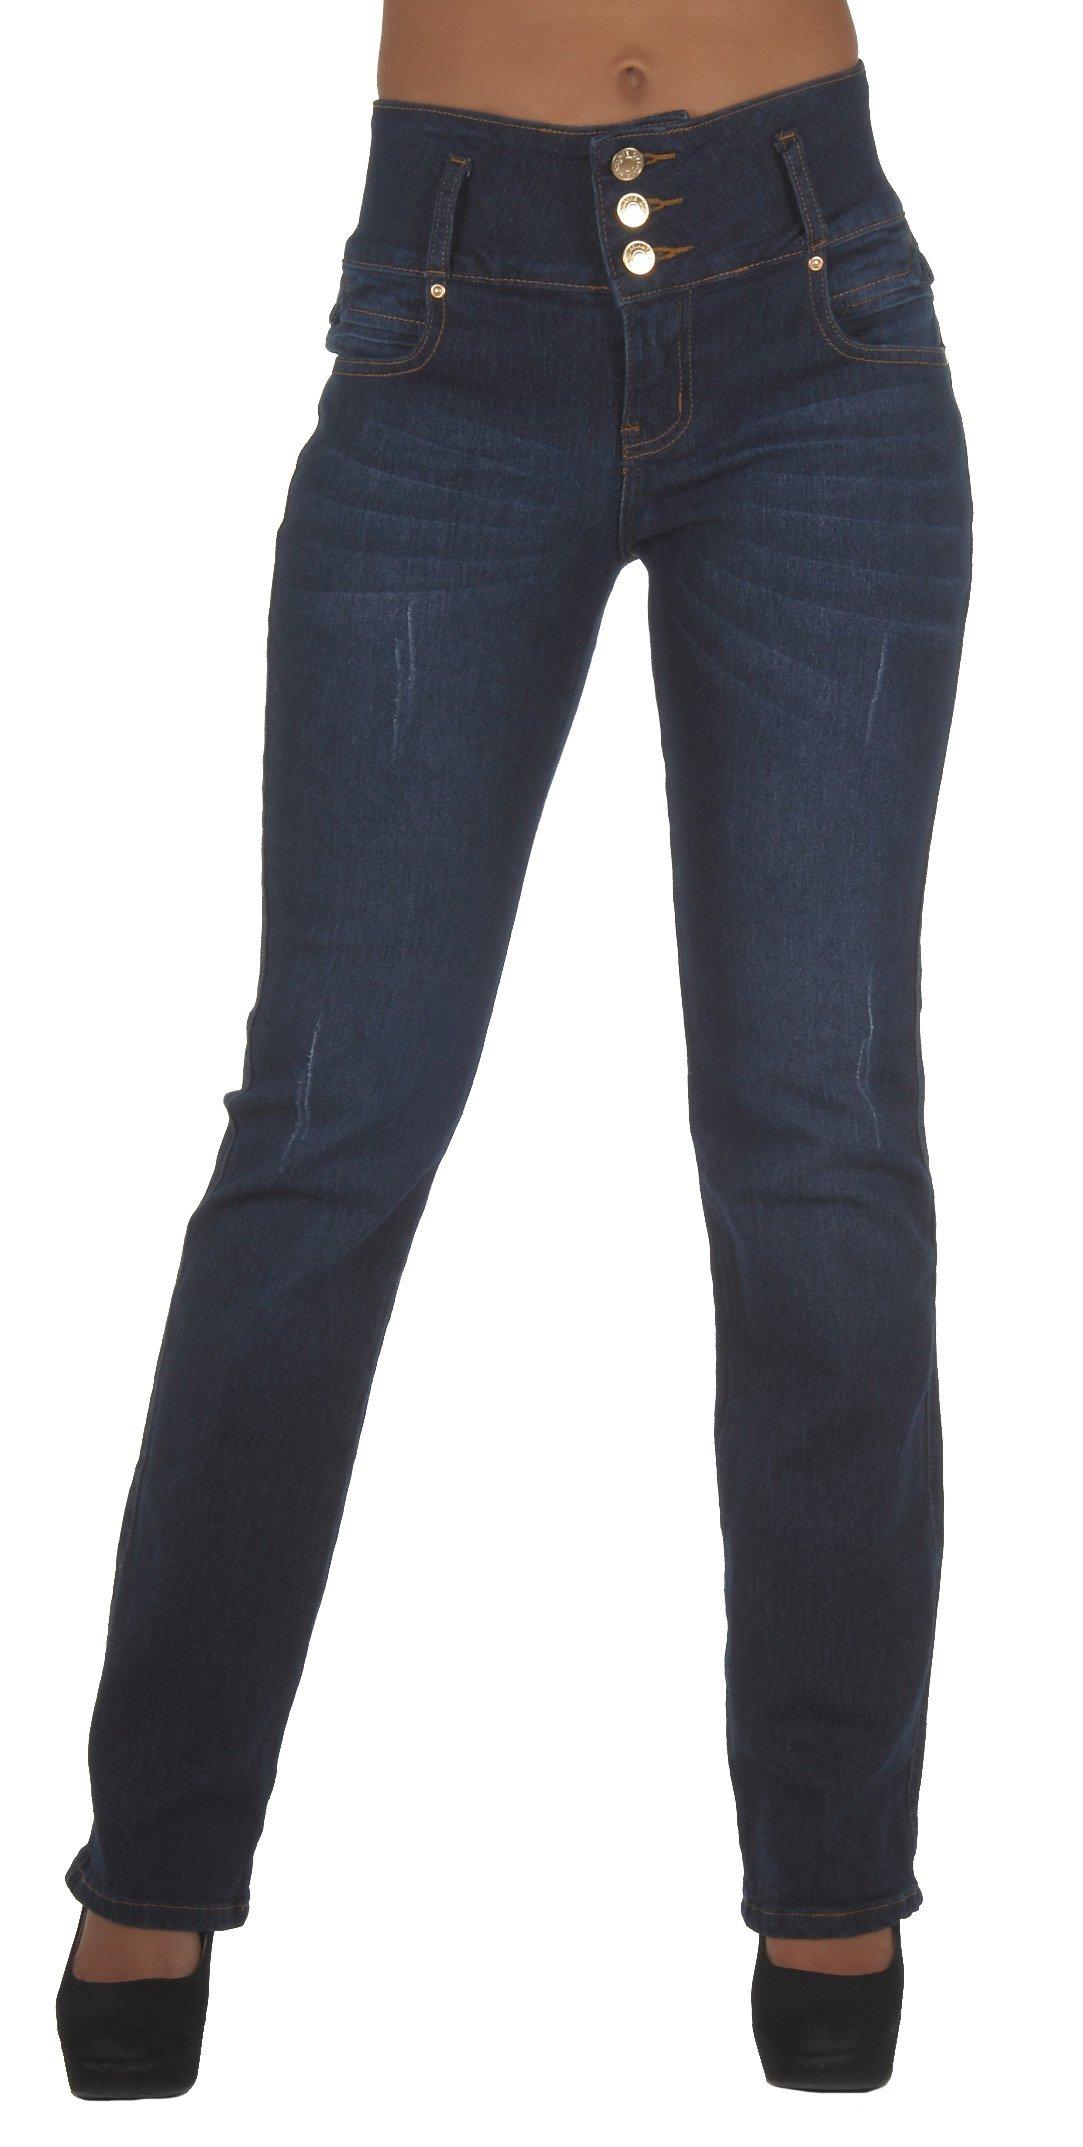 Diamante Style N491BT– Colombian Design, Butt Lift, Stretch Boot Leg Jeans in Dark Blue 5